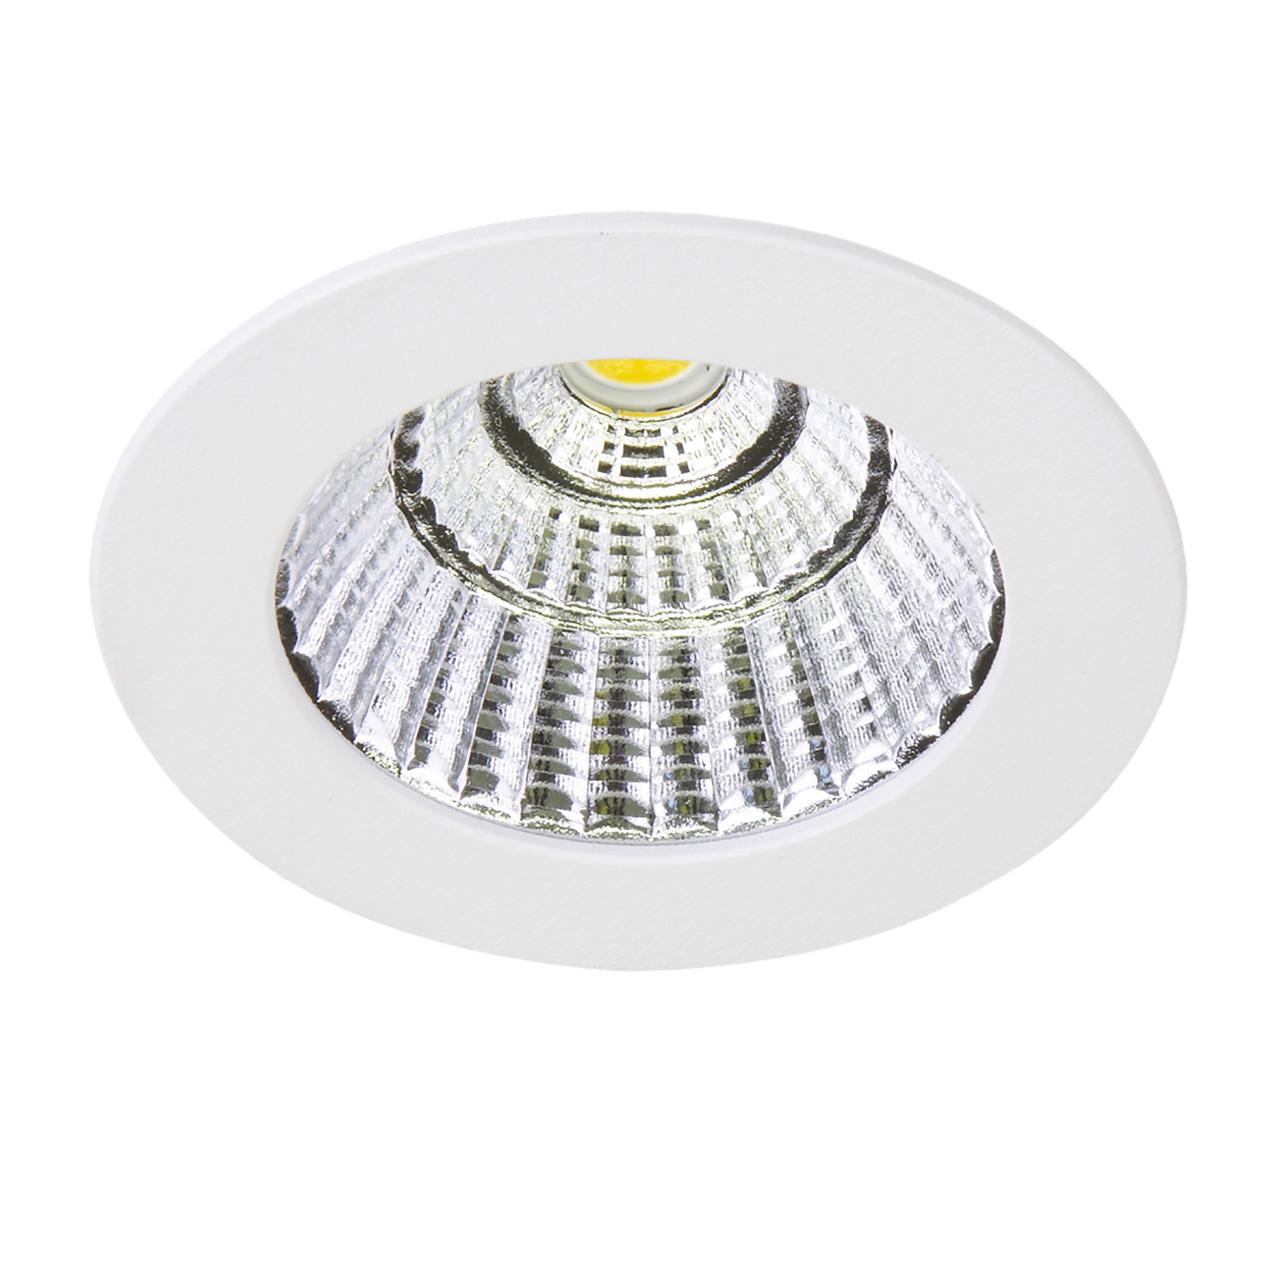 Светильник SOFFI 11 LED 7W 630LM 40G белый 3000K Lightstar 212416